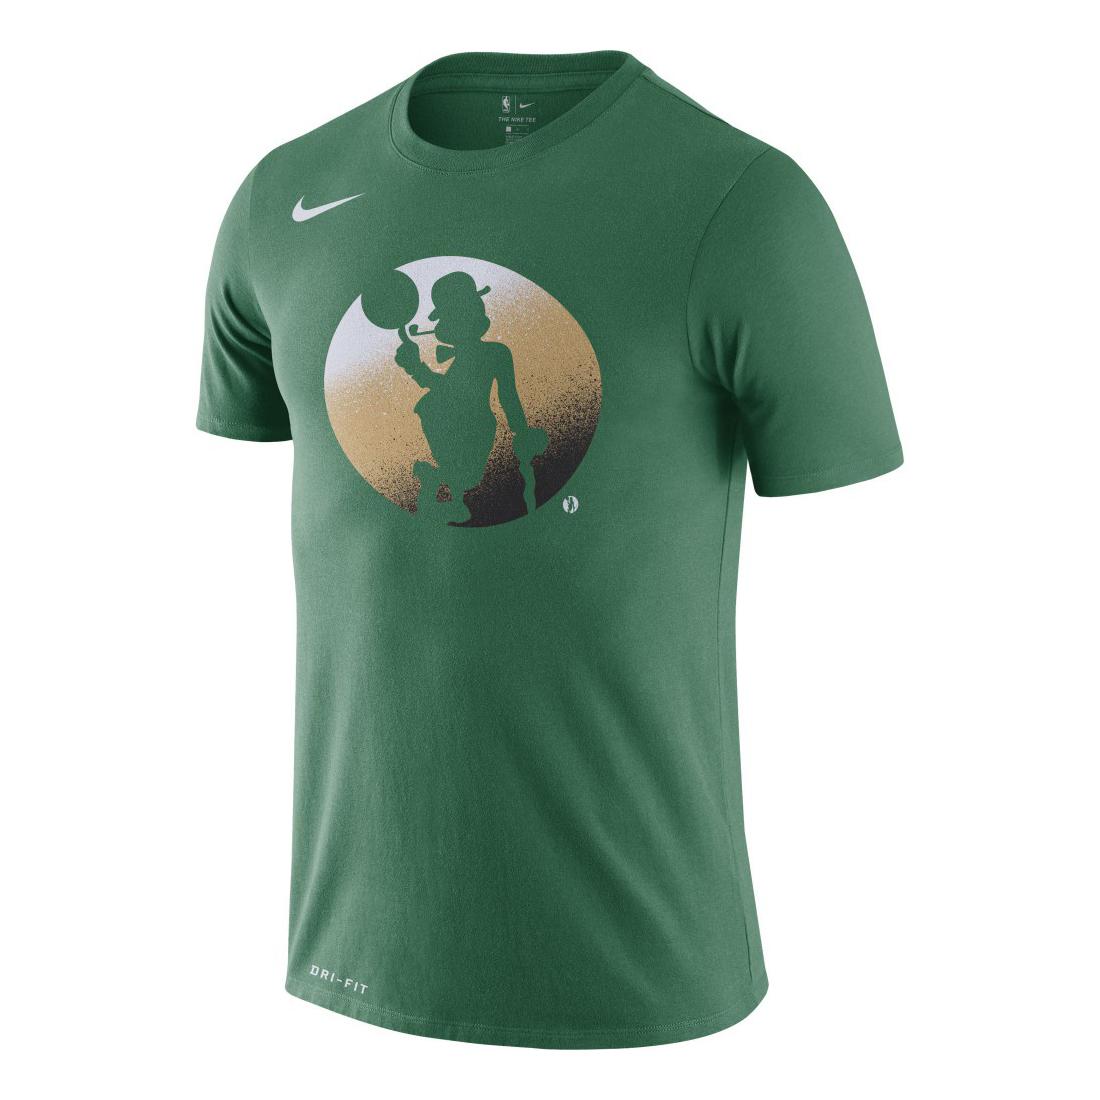 bf0f21261fef Nike NBA Boston Celtics Dri-FIT T-Shirt - NBA Shop Boston Celtics  Merchandise - Superfanas.lt